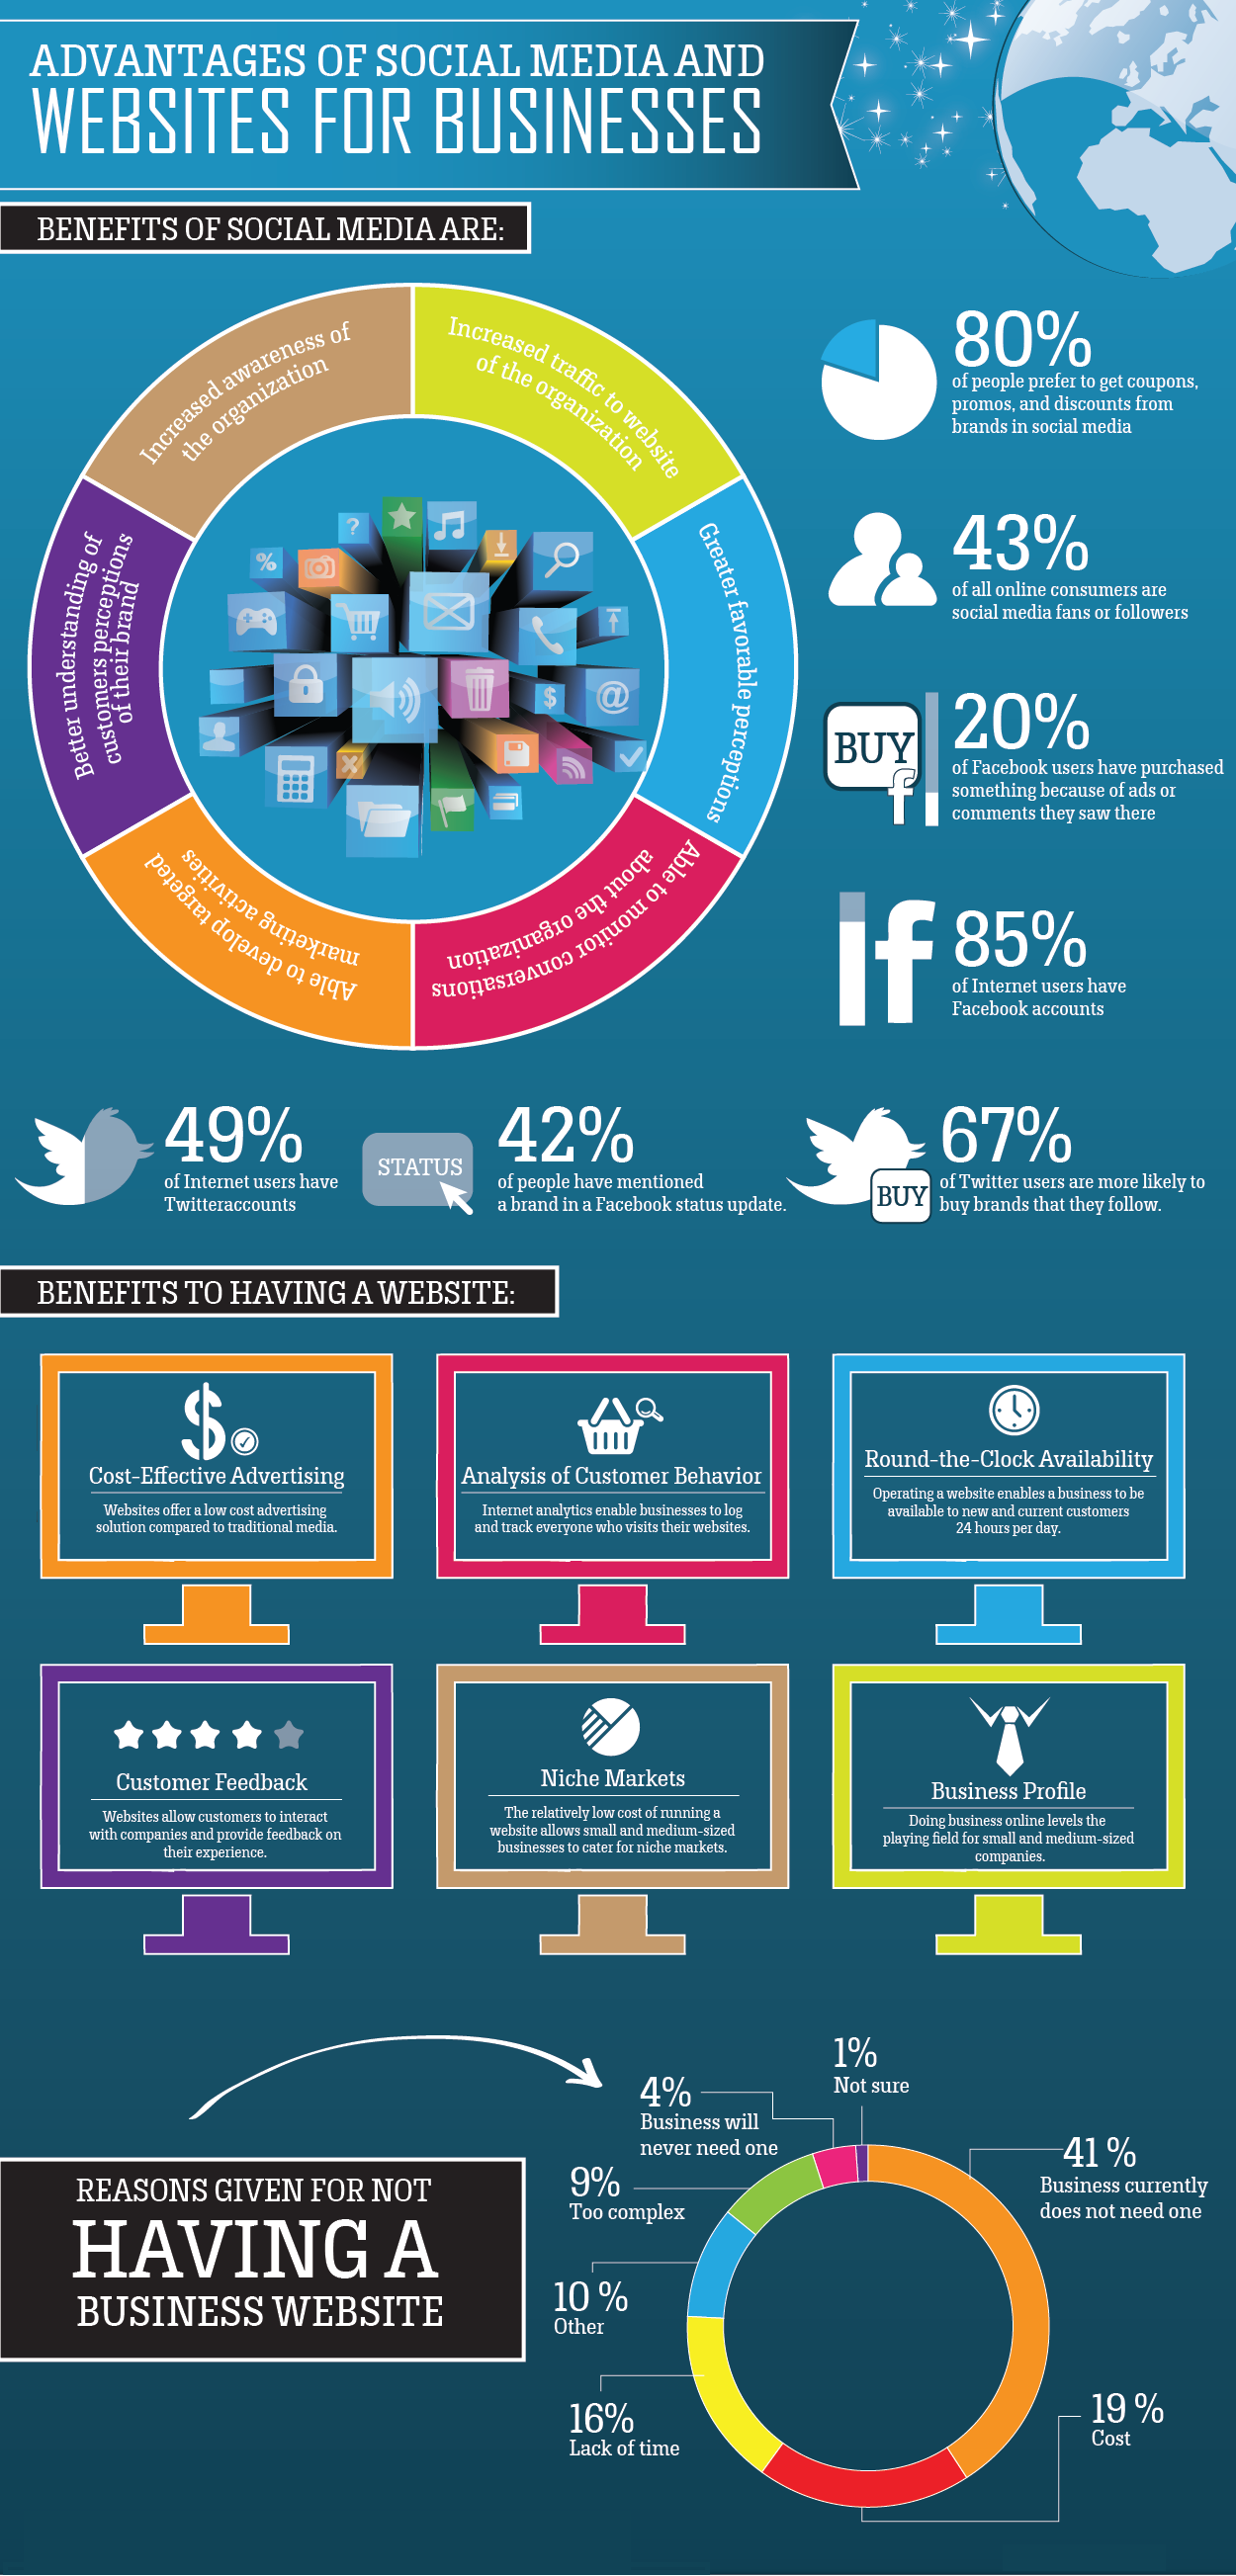 Why Social Media Marketing Is Important For Small Business Socialmedia Mercadotecnia En Medios Sociales Marketing De Contenidos Infografia